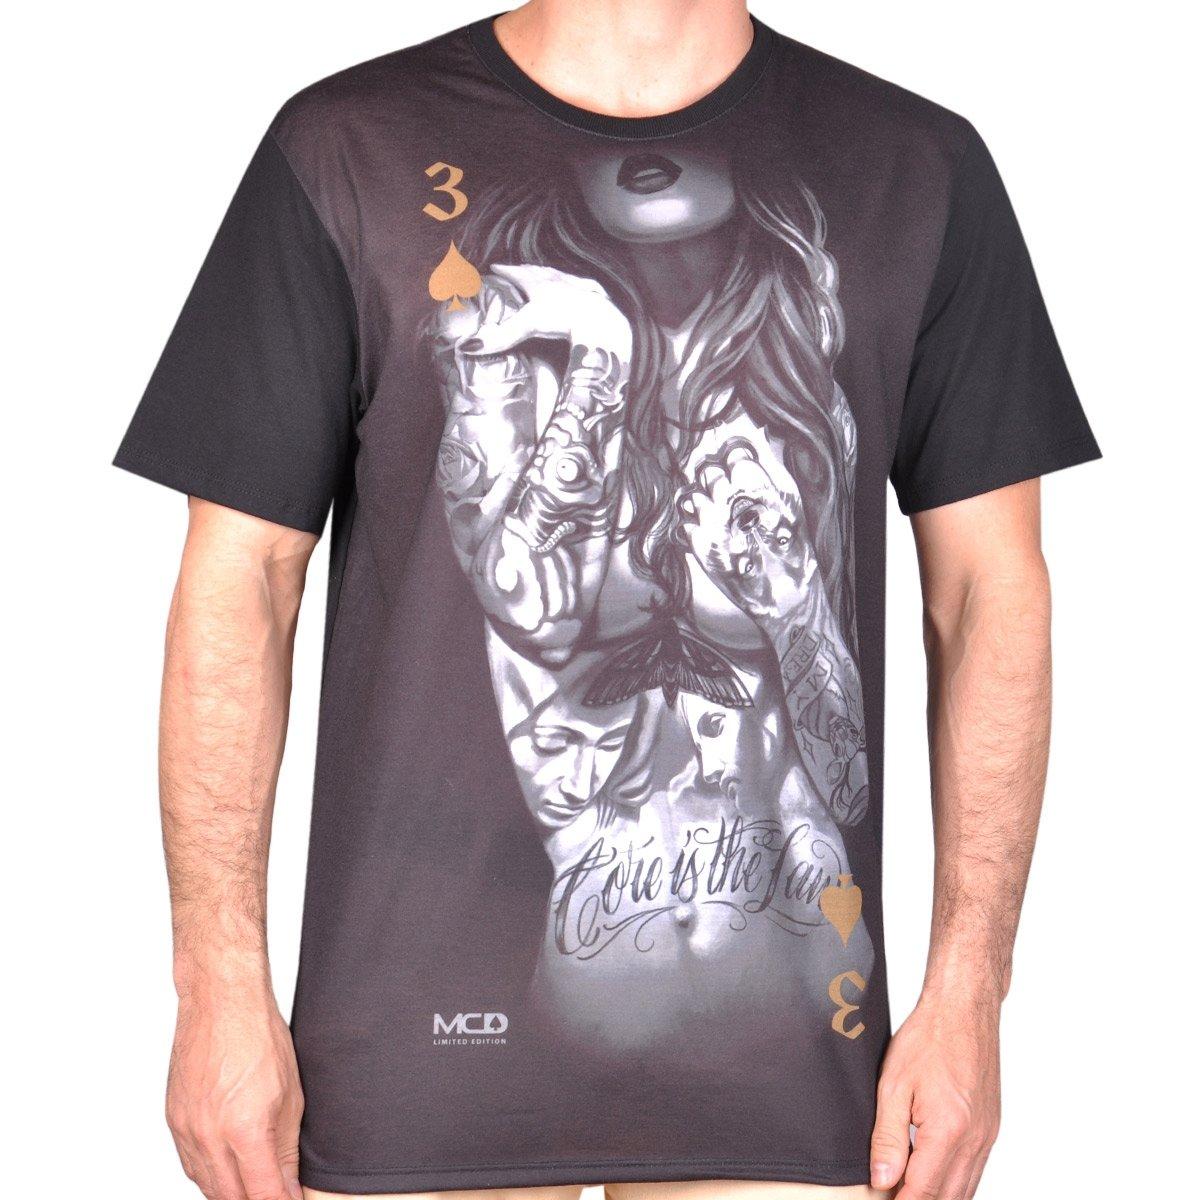 751a1d5f7a861 Camiseta Mcd Tattoo Week Sharo Ii - Preto - P - Compre Agora